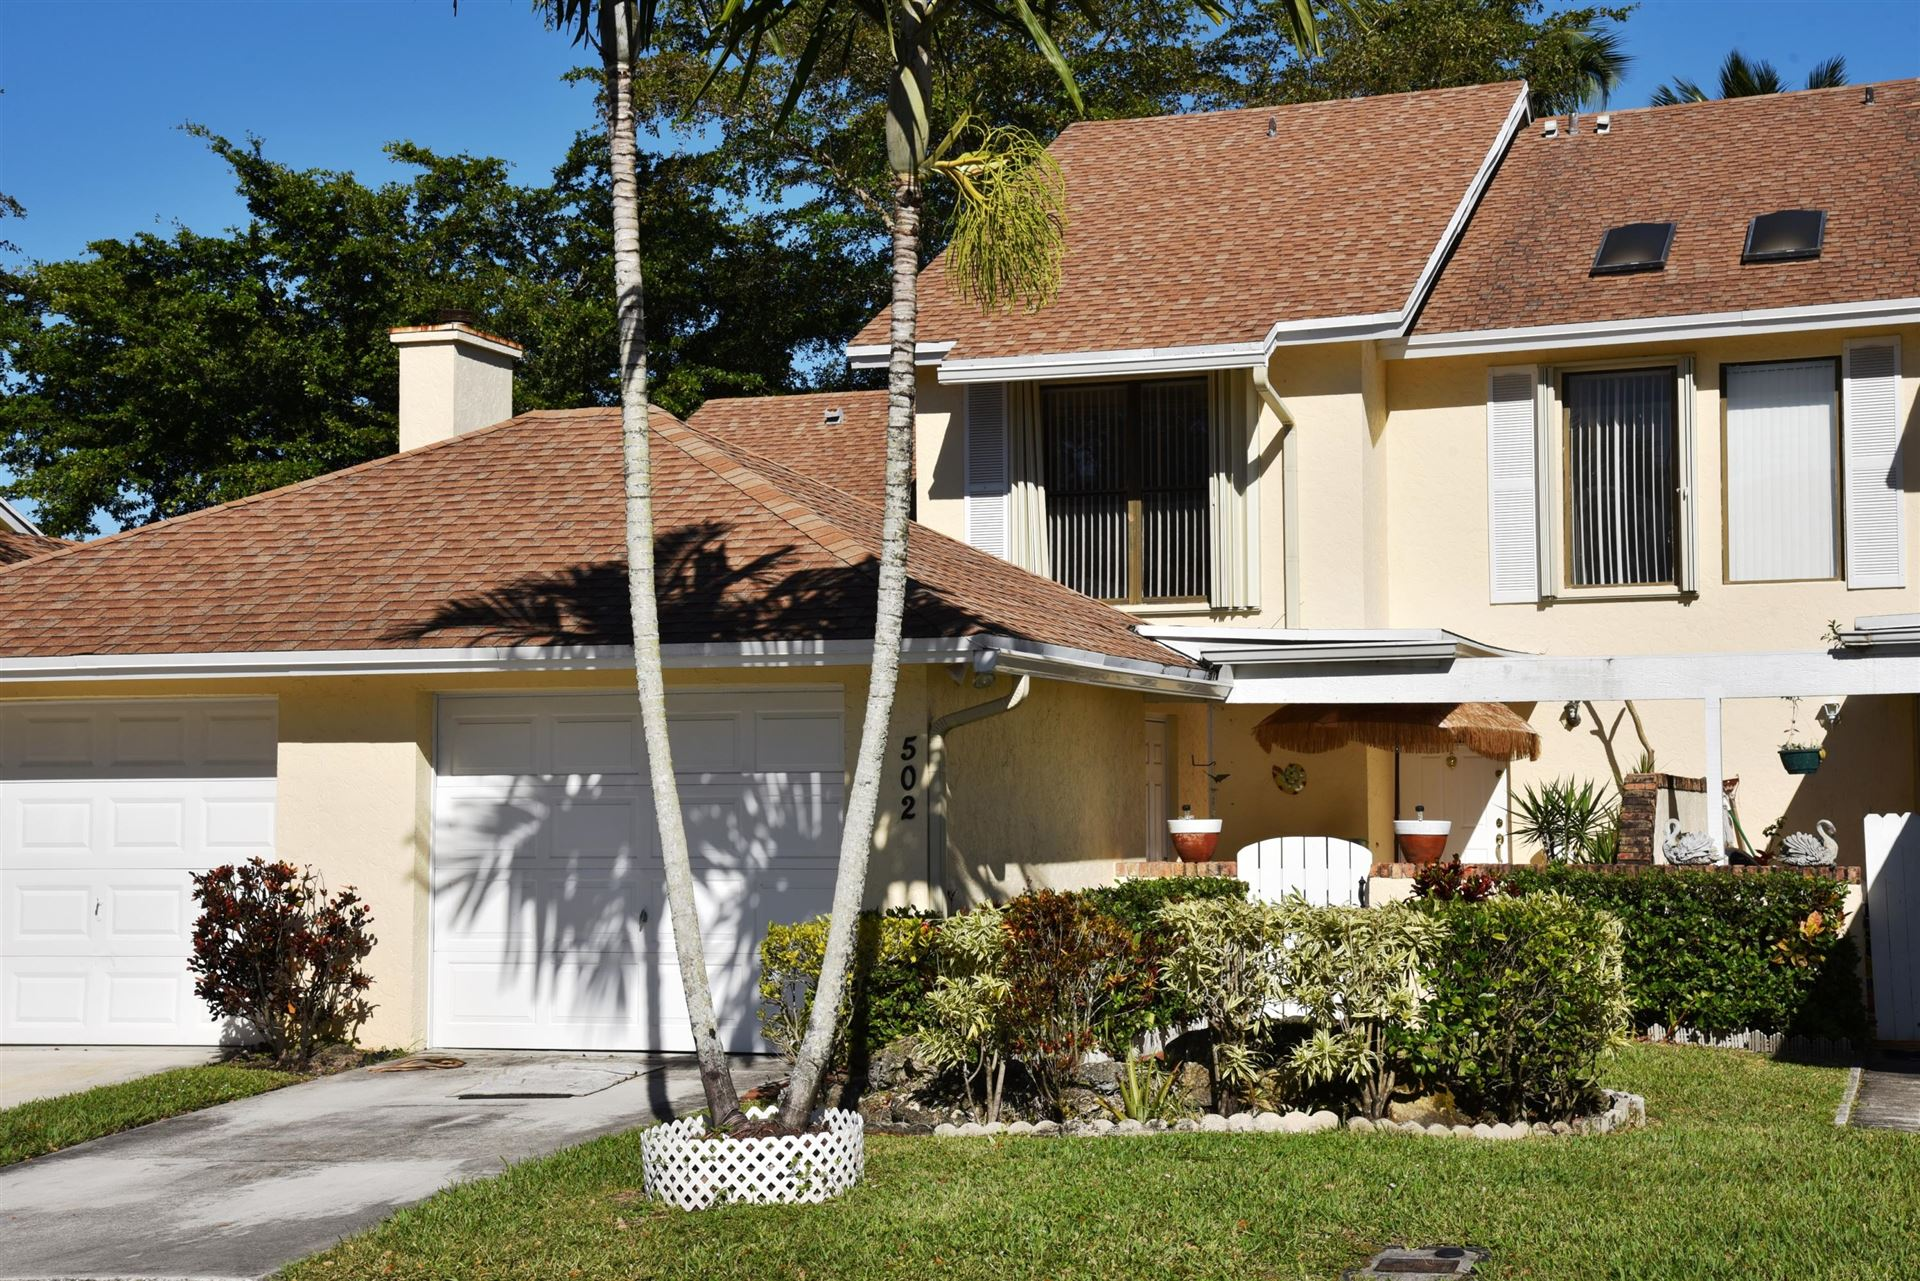 502 Maplewood Drive, Greenacres, FL 33415 - MLS#: RX-10588371